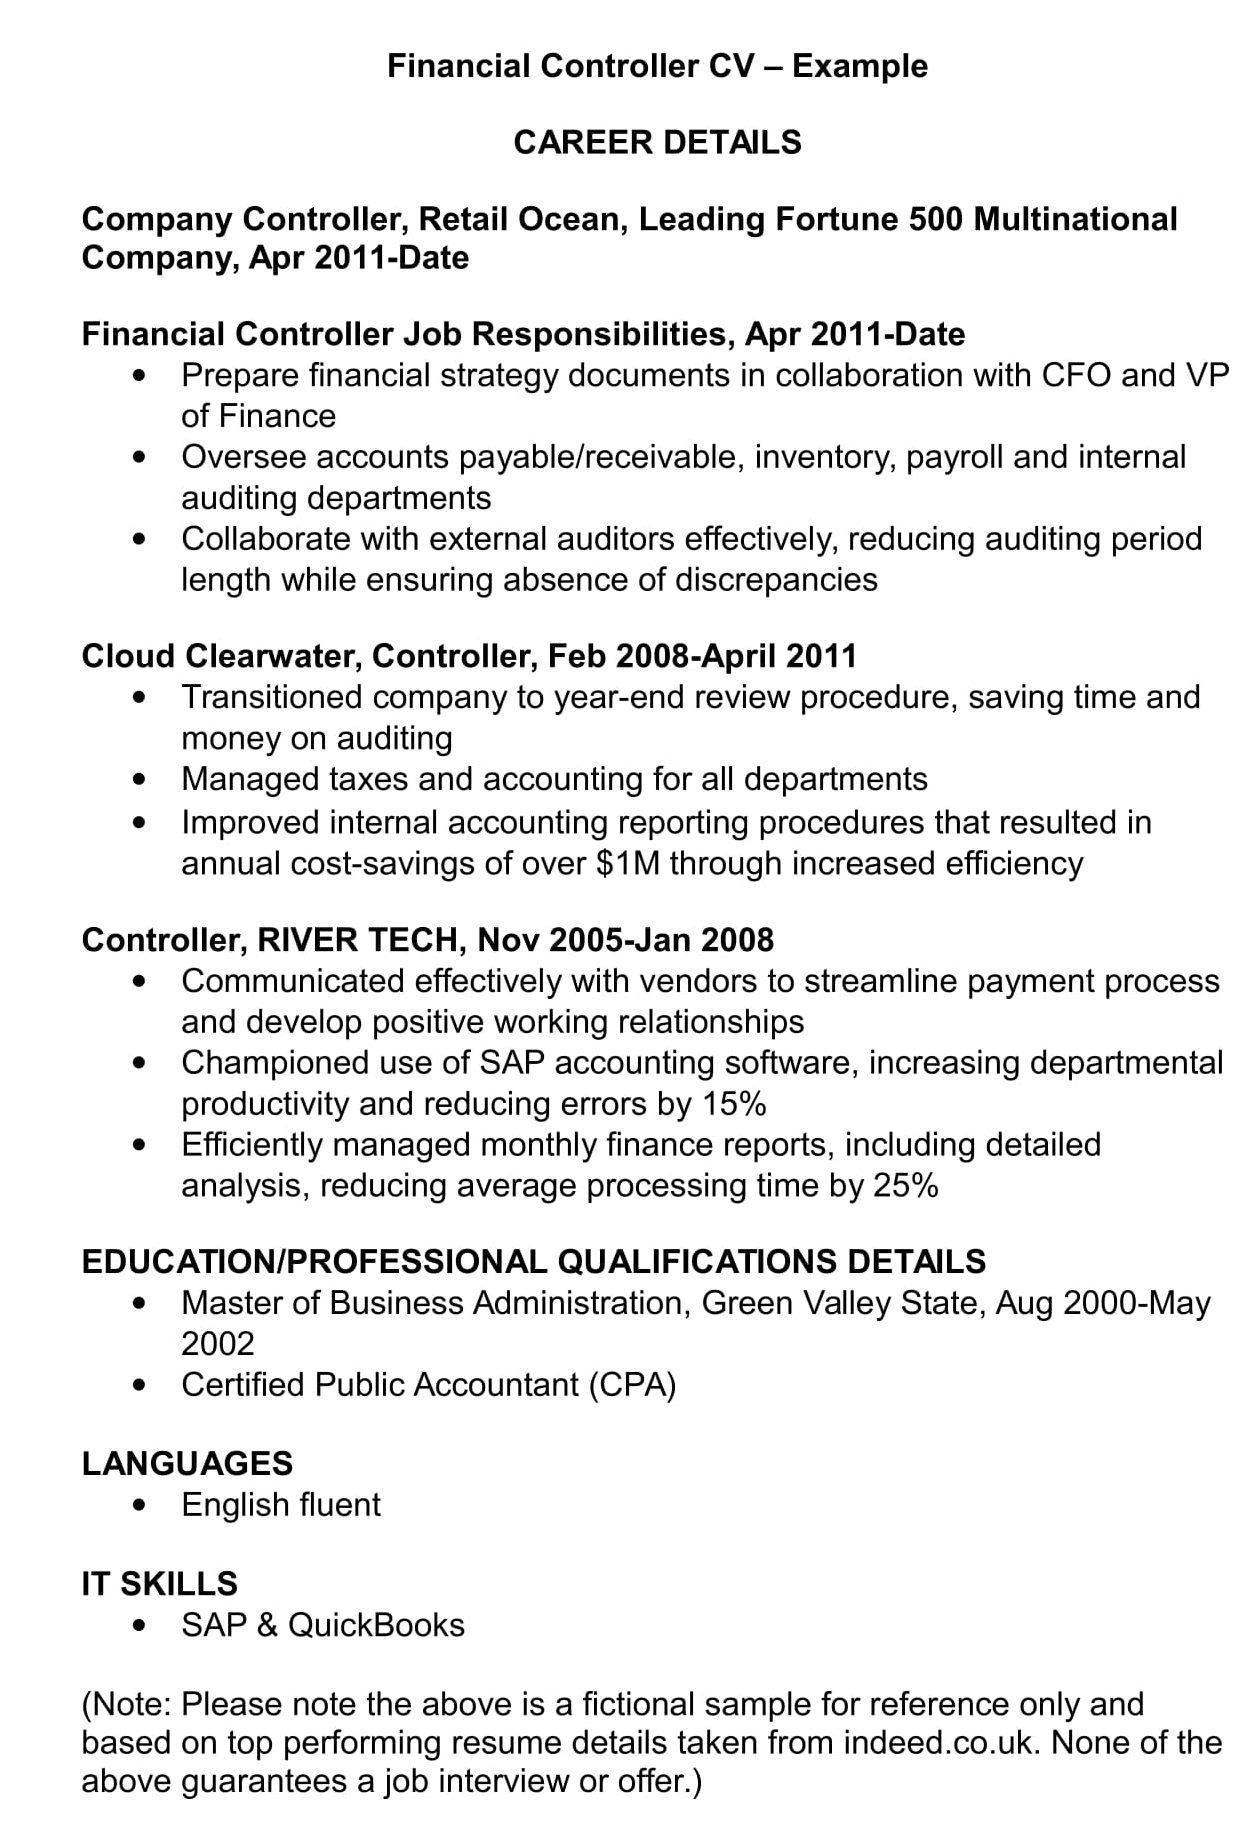 Financial Controller Cv Template And Examples Renaix Com